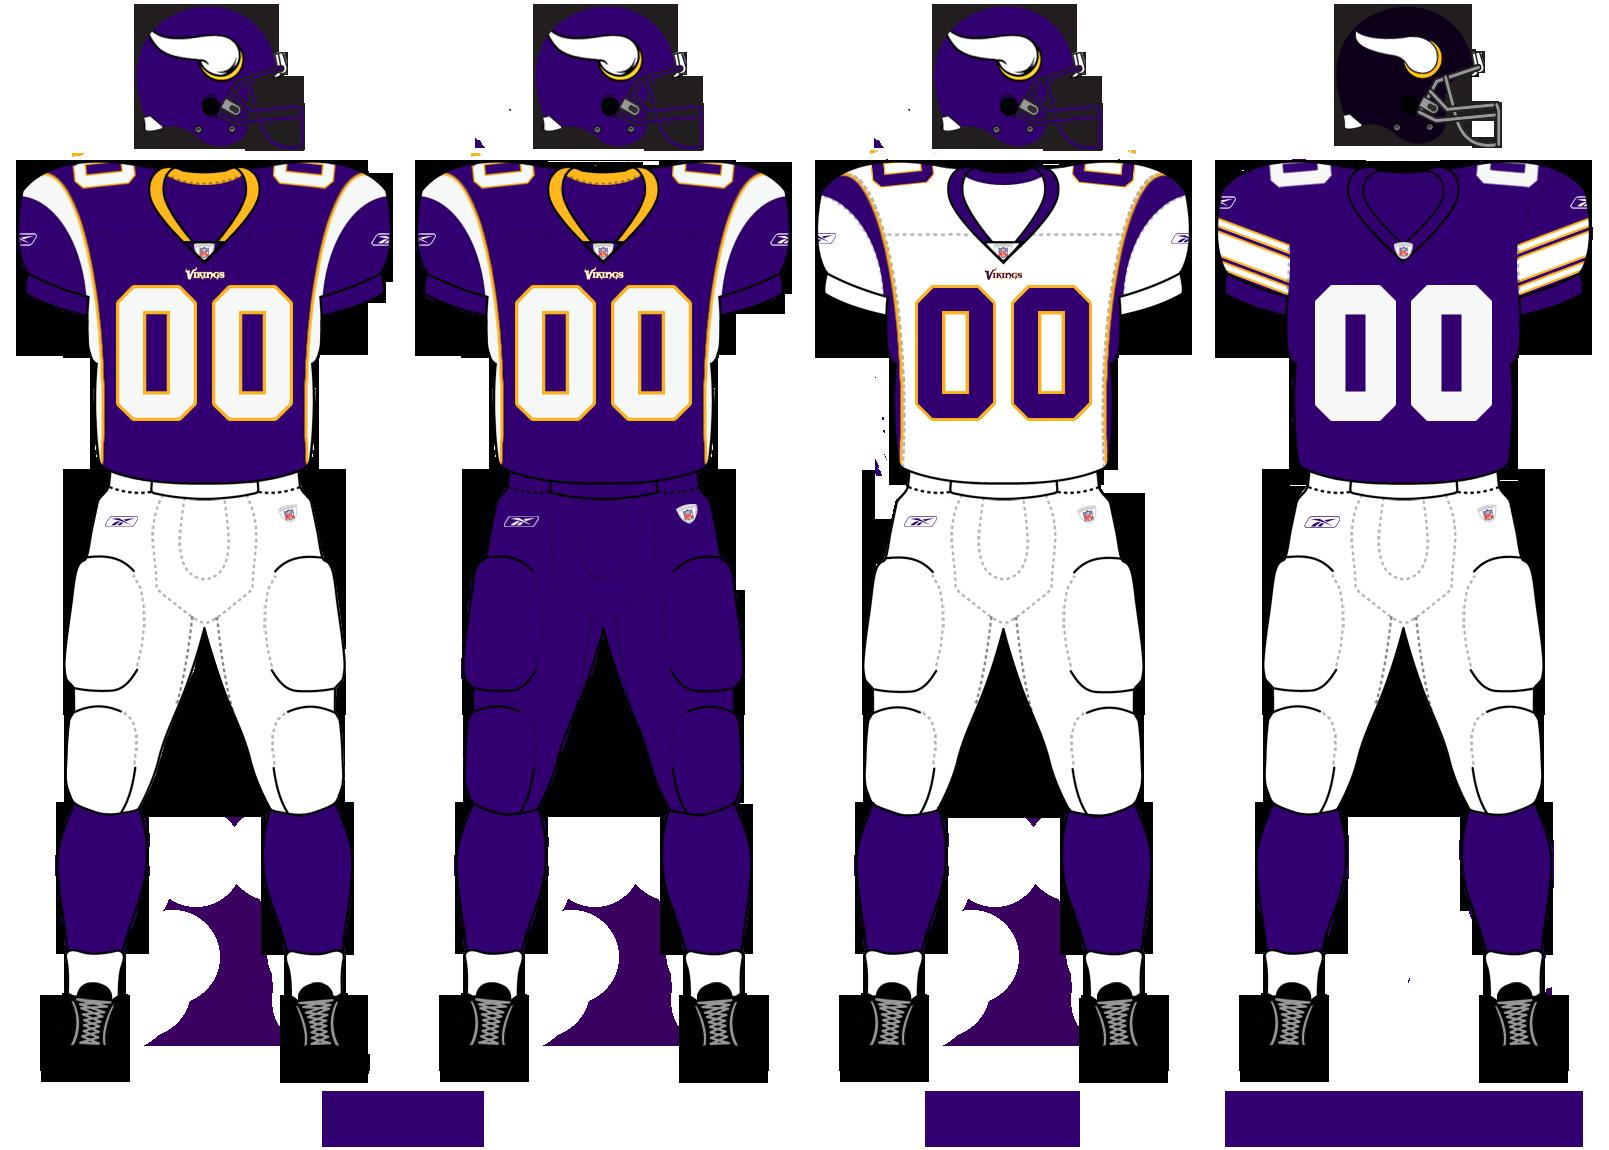 FileMinnesota Vikings 2007 Uniforms